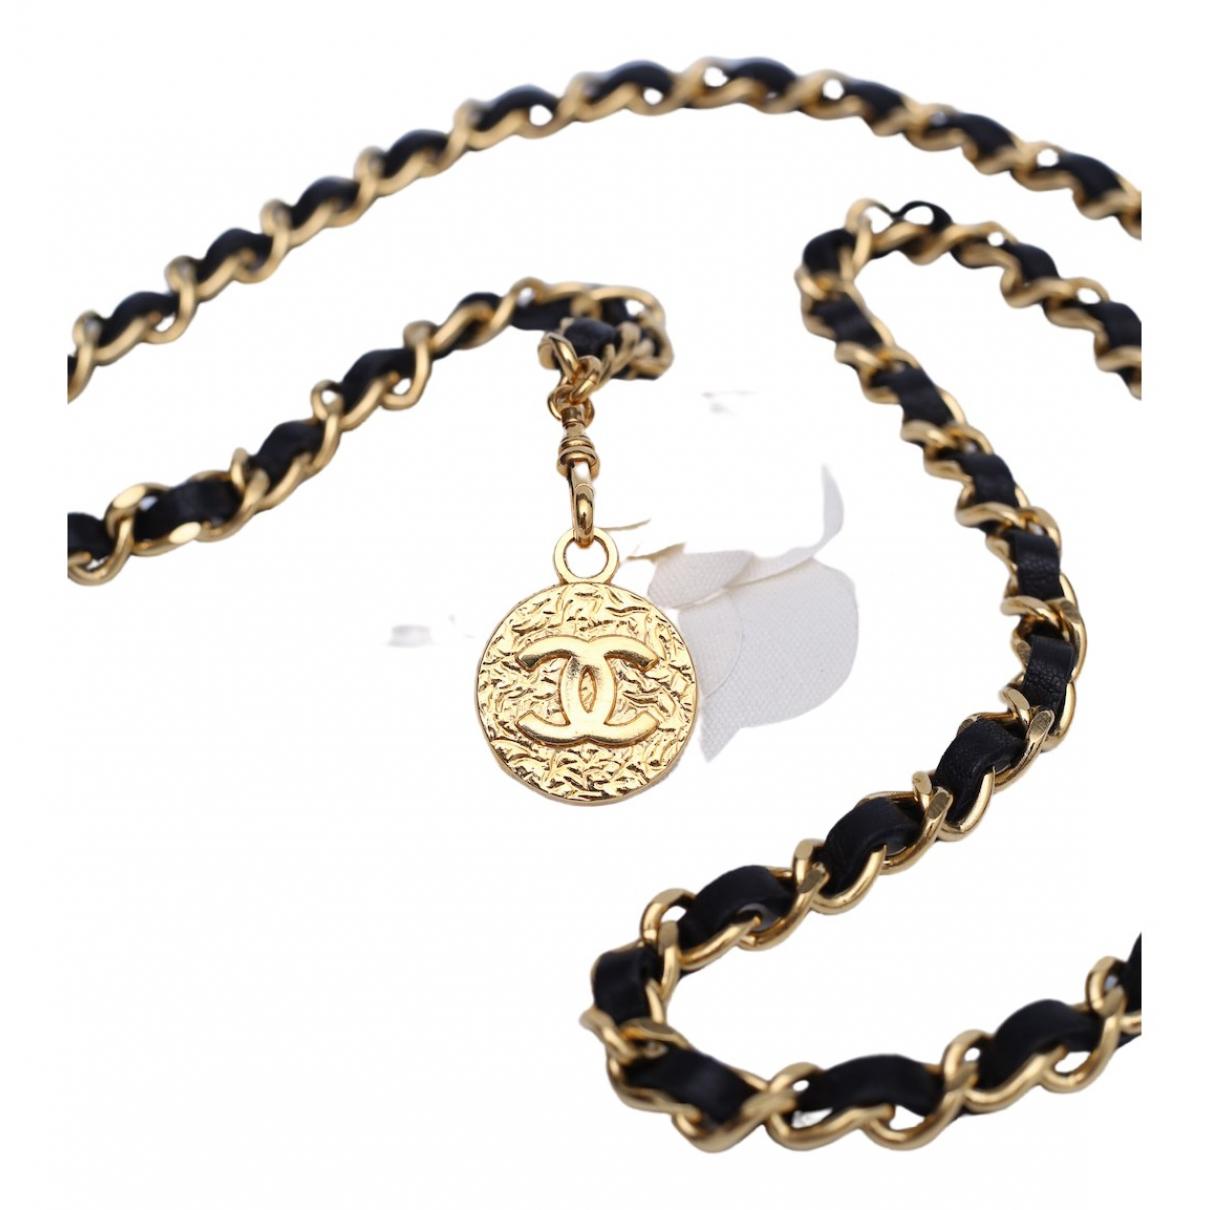 Chanel \N Black Leather belt for Women 95 cm